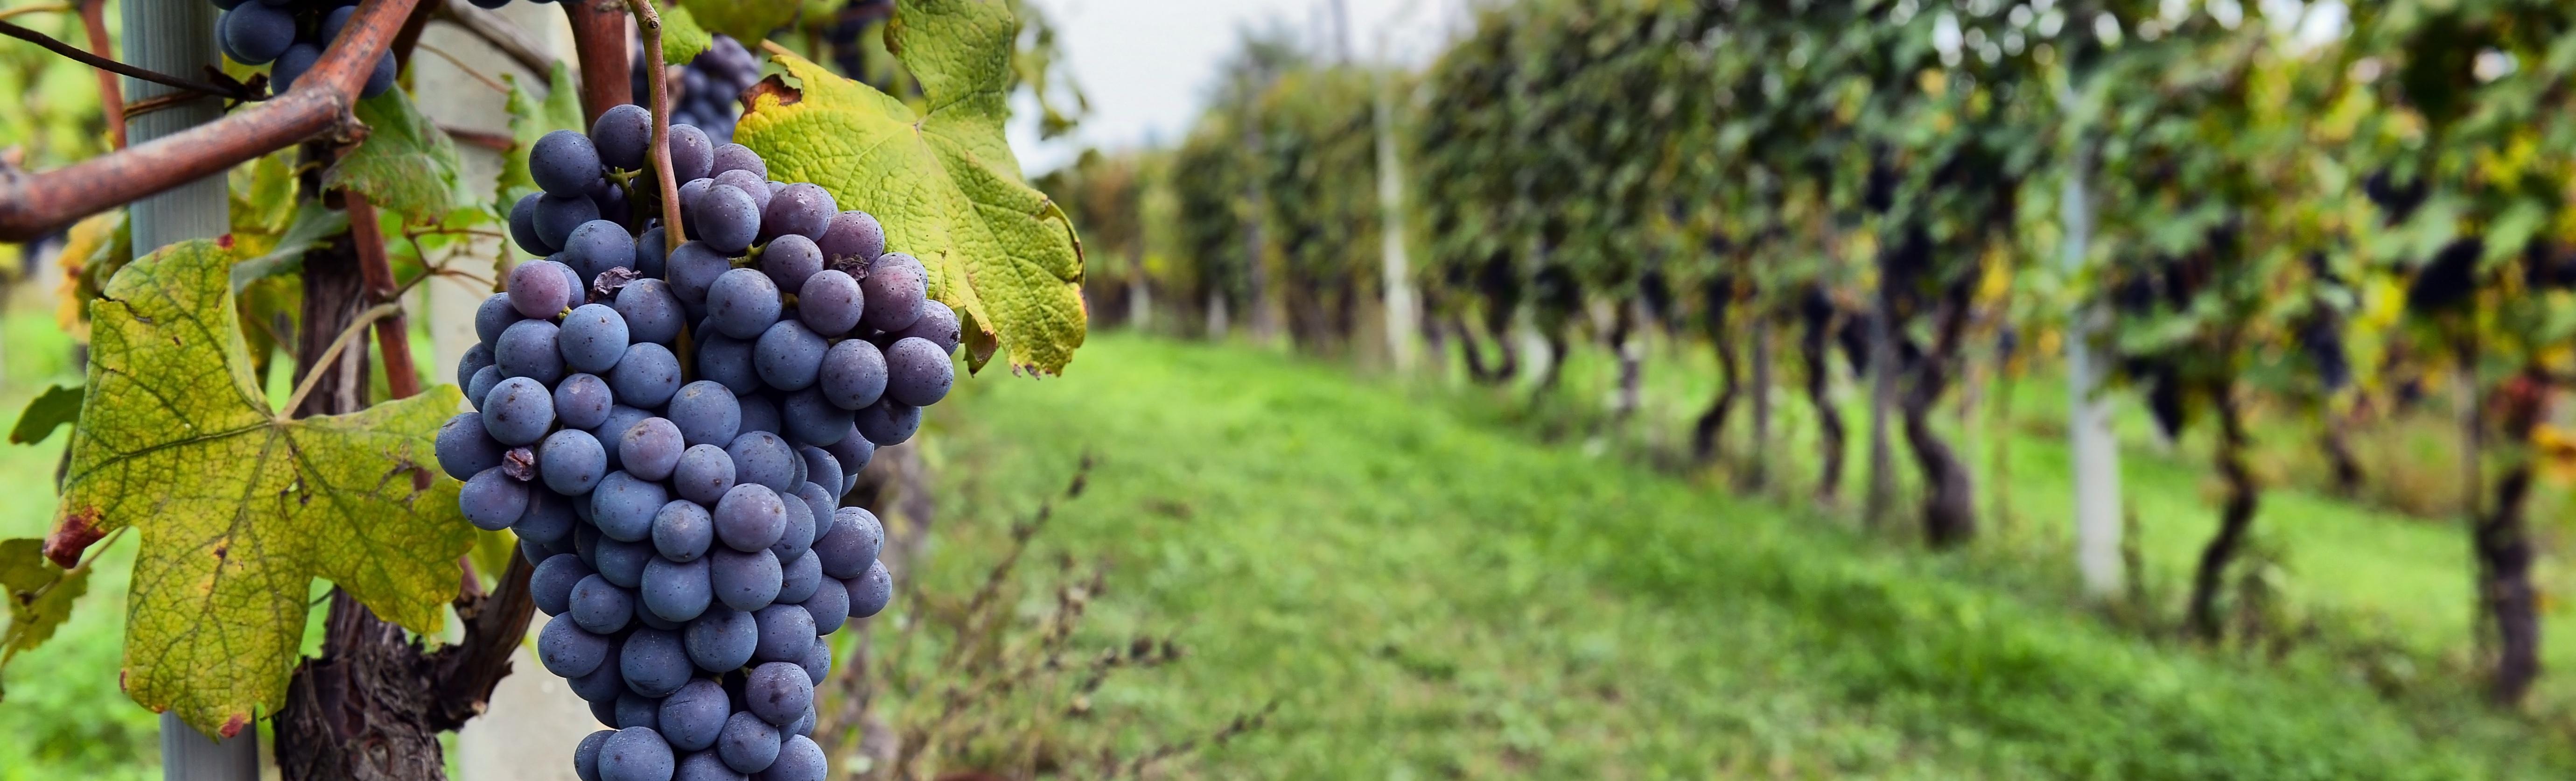 Winemaking Excellence - Vineyards | Terlato Vineyards